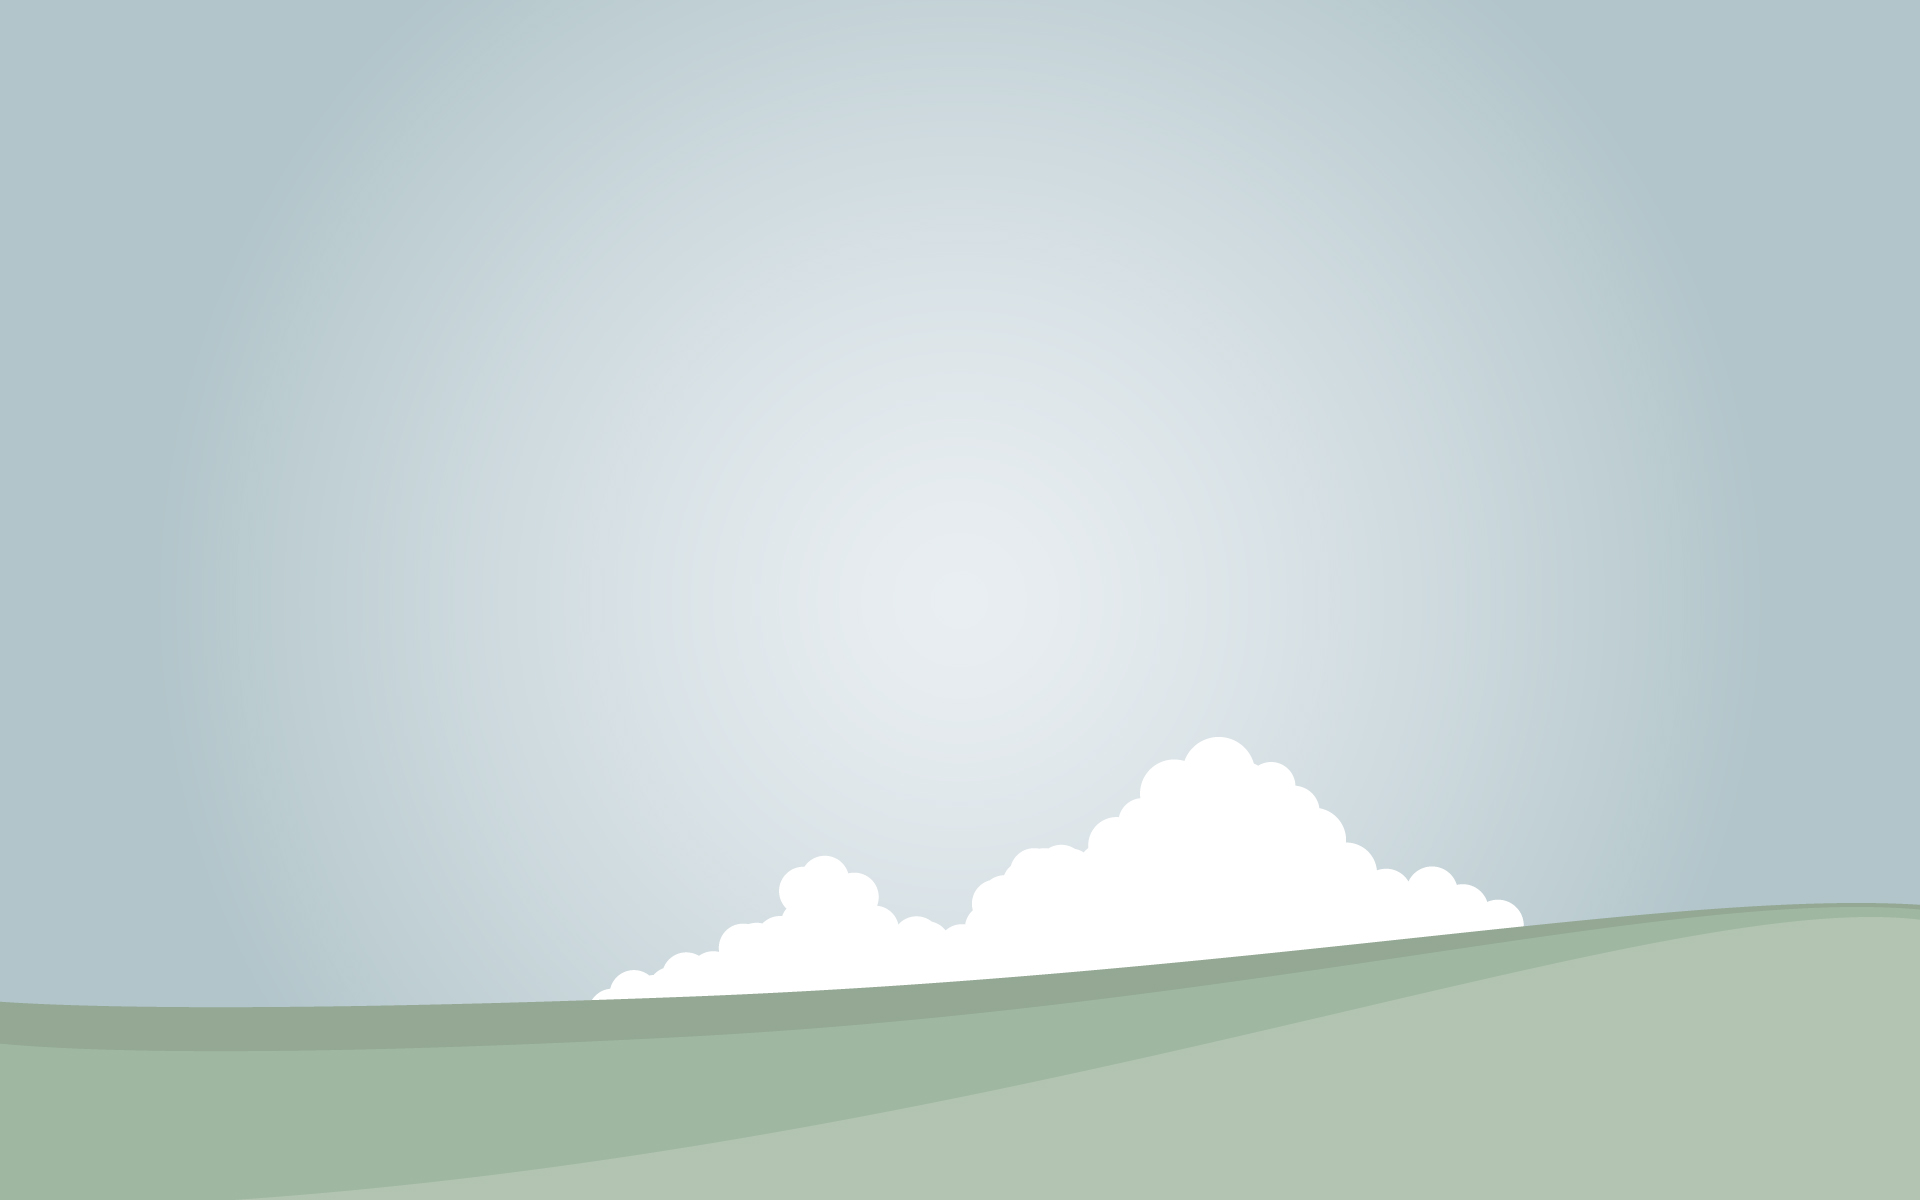 Cell Wallpaper Hd Illustration Fall Free Download Minimalist Wallpapers Hd Pixelstalk Net